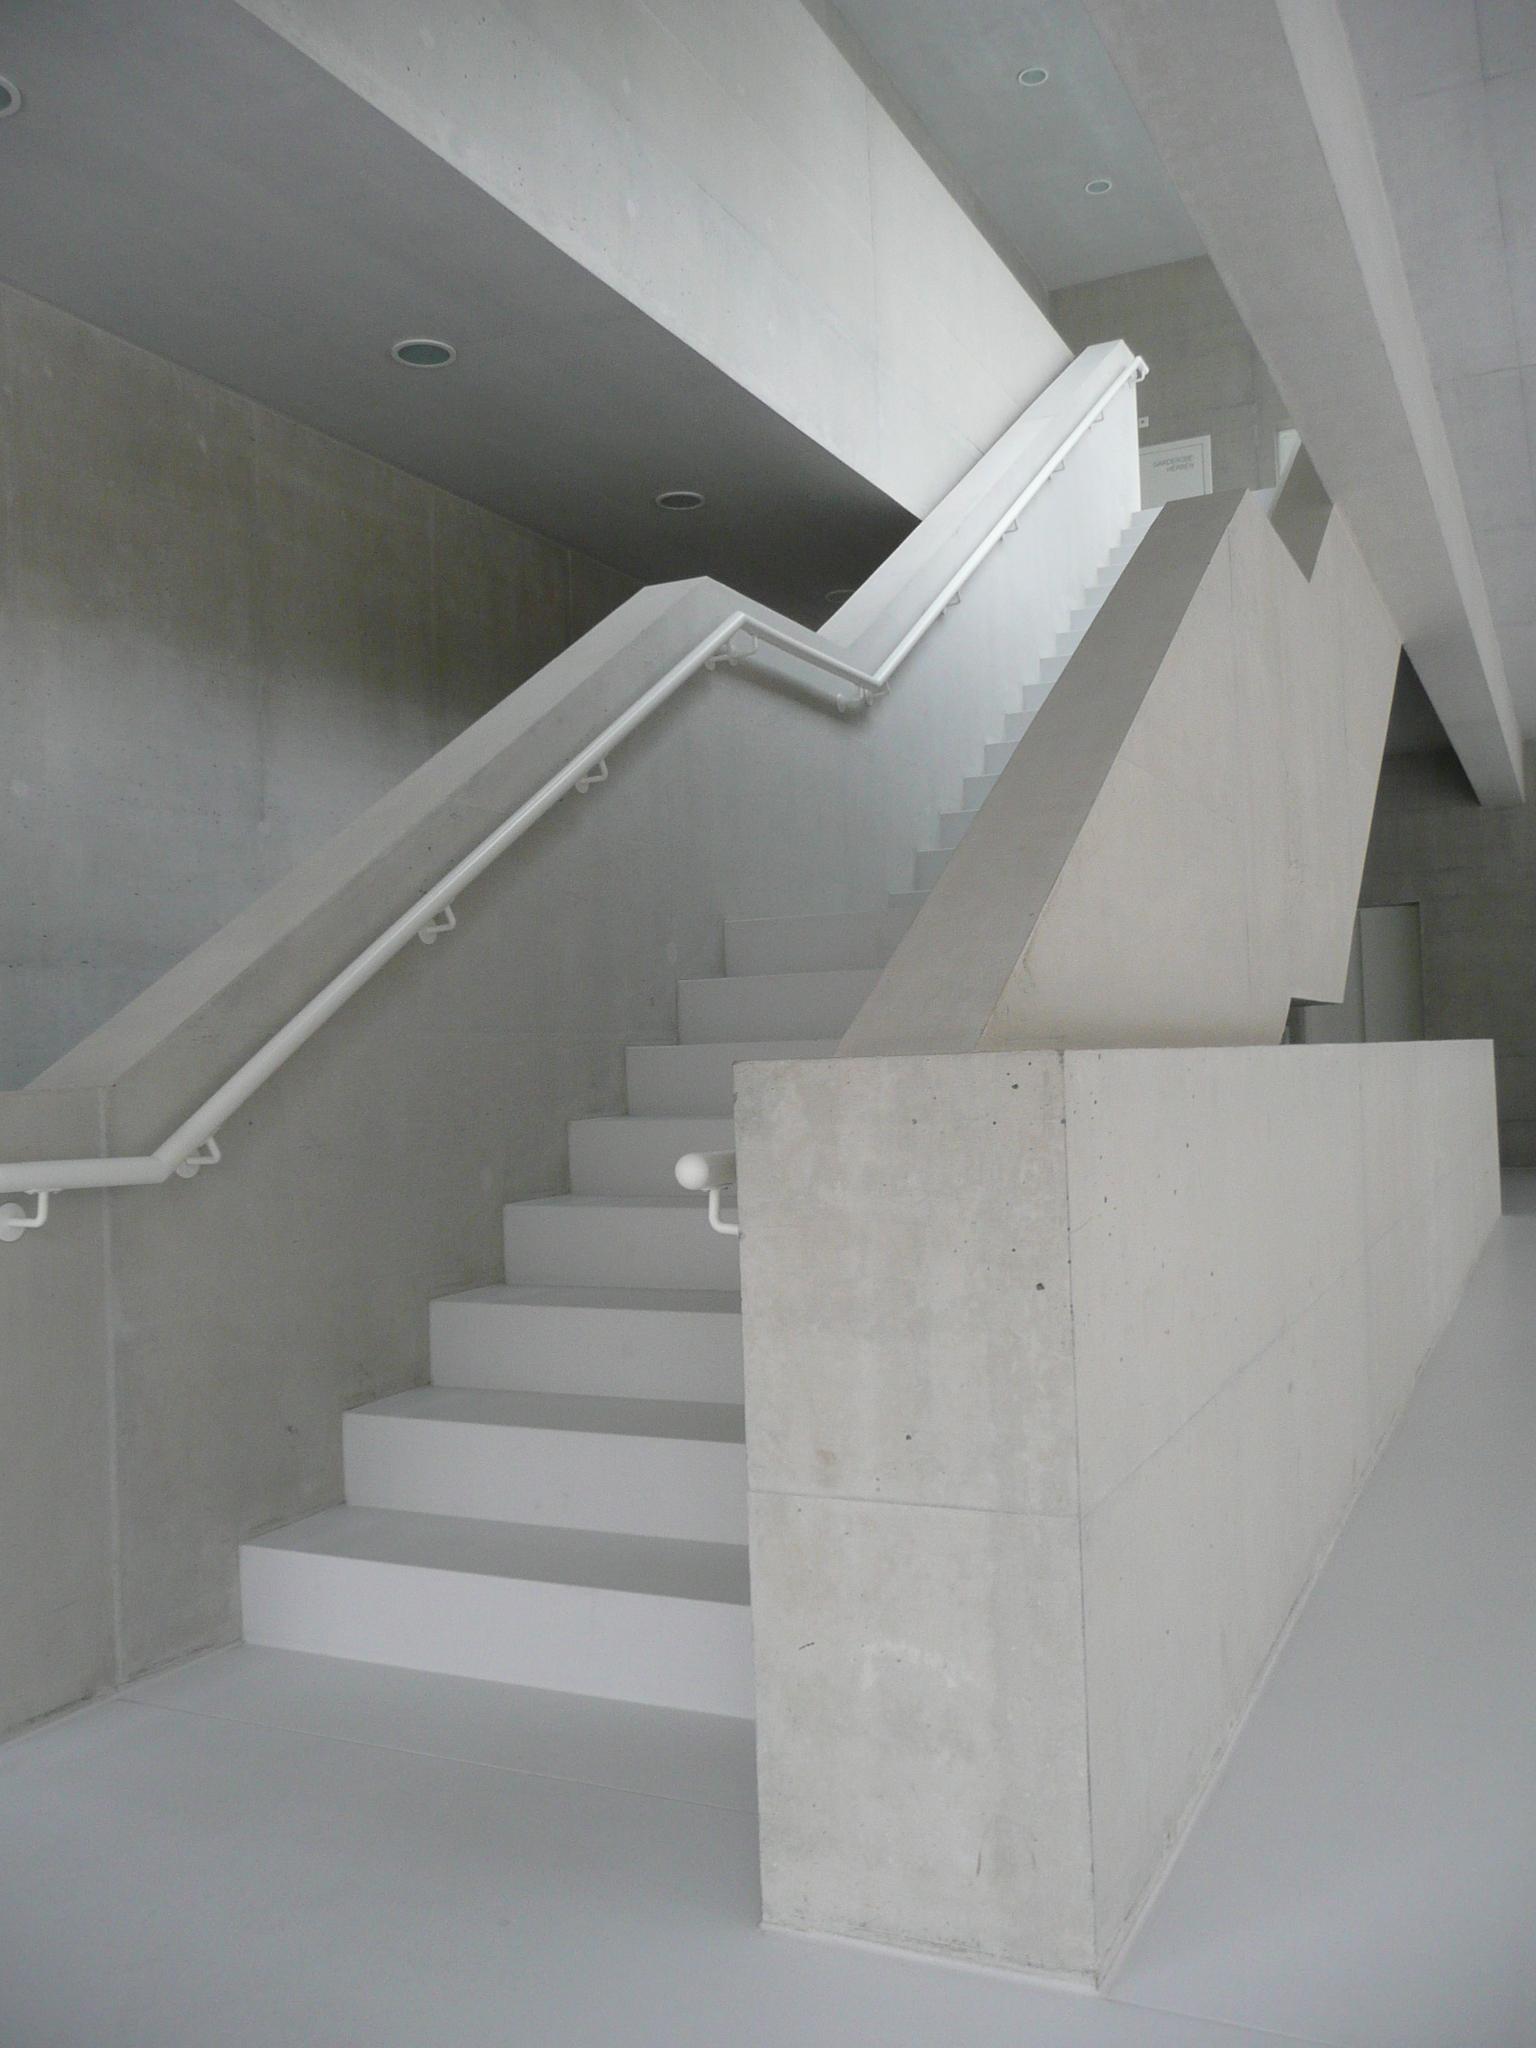 BEECK Concrete Stone Glaze Project - Gym in Liestal Switzerland